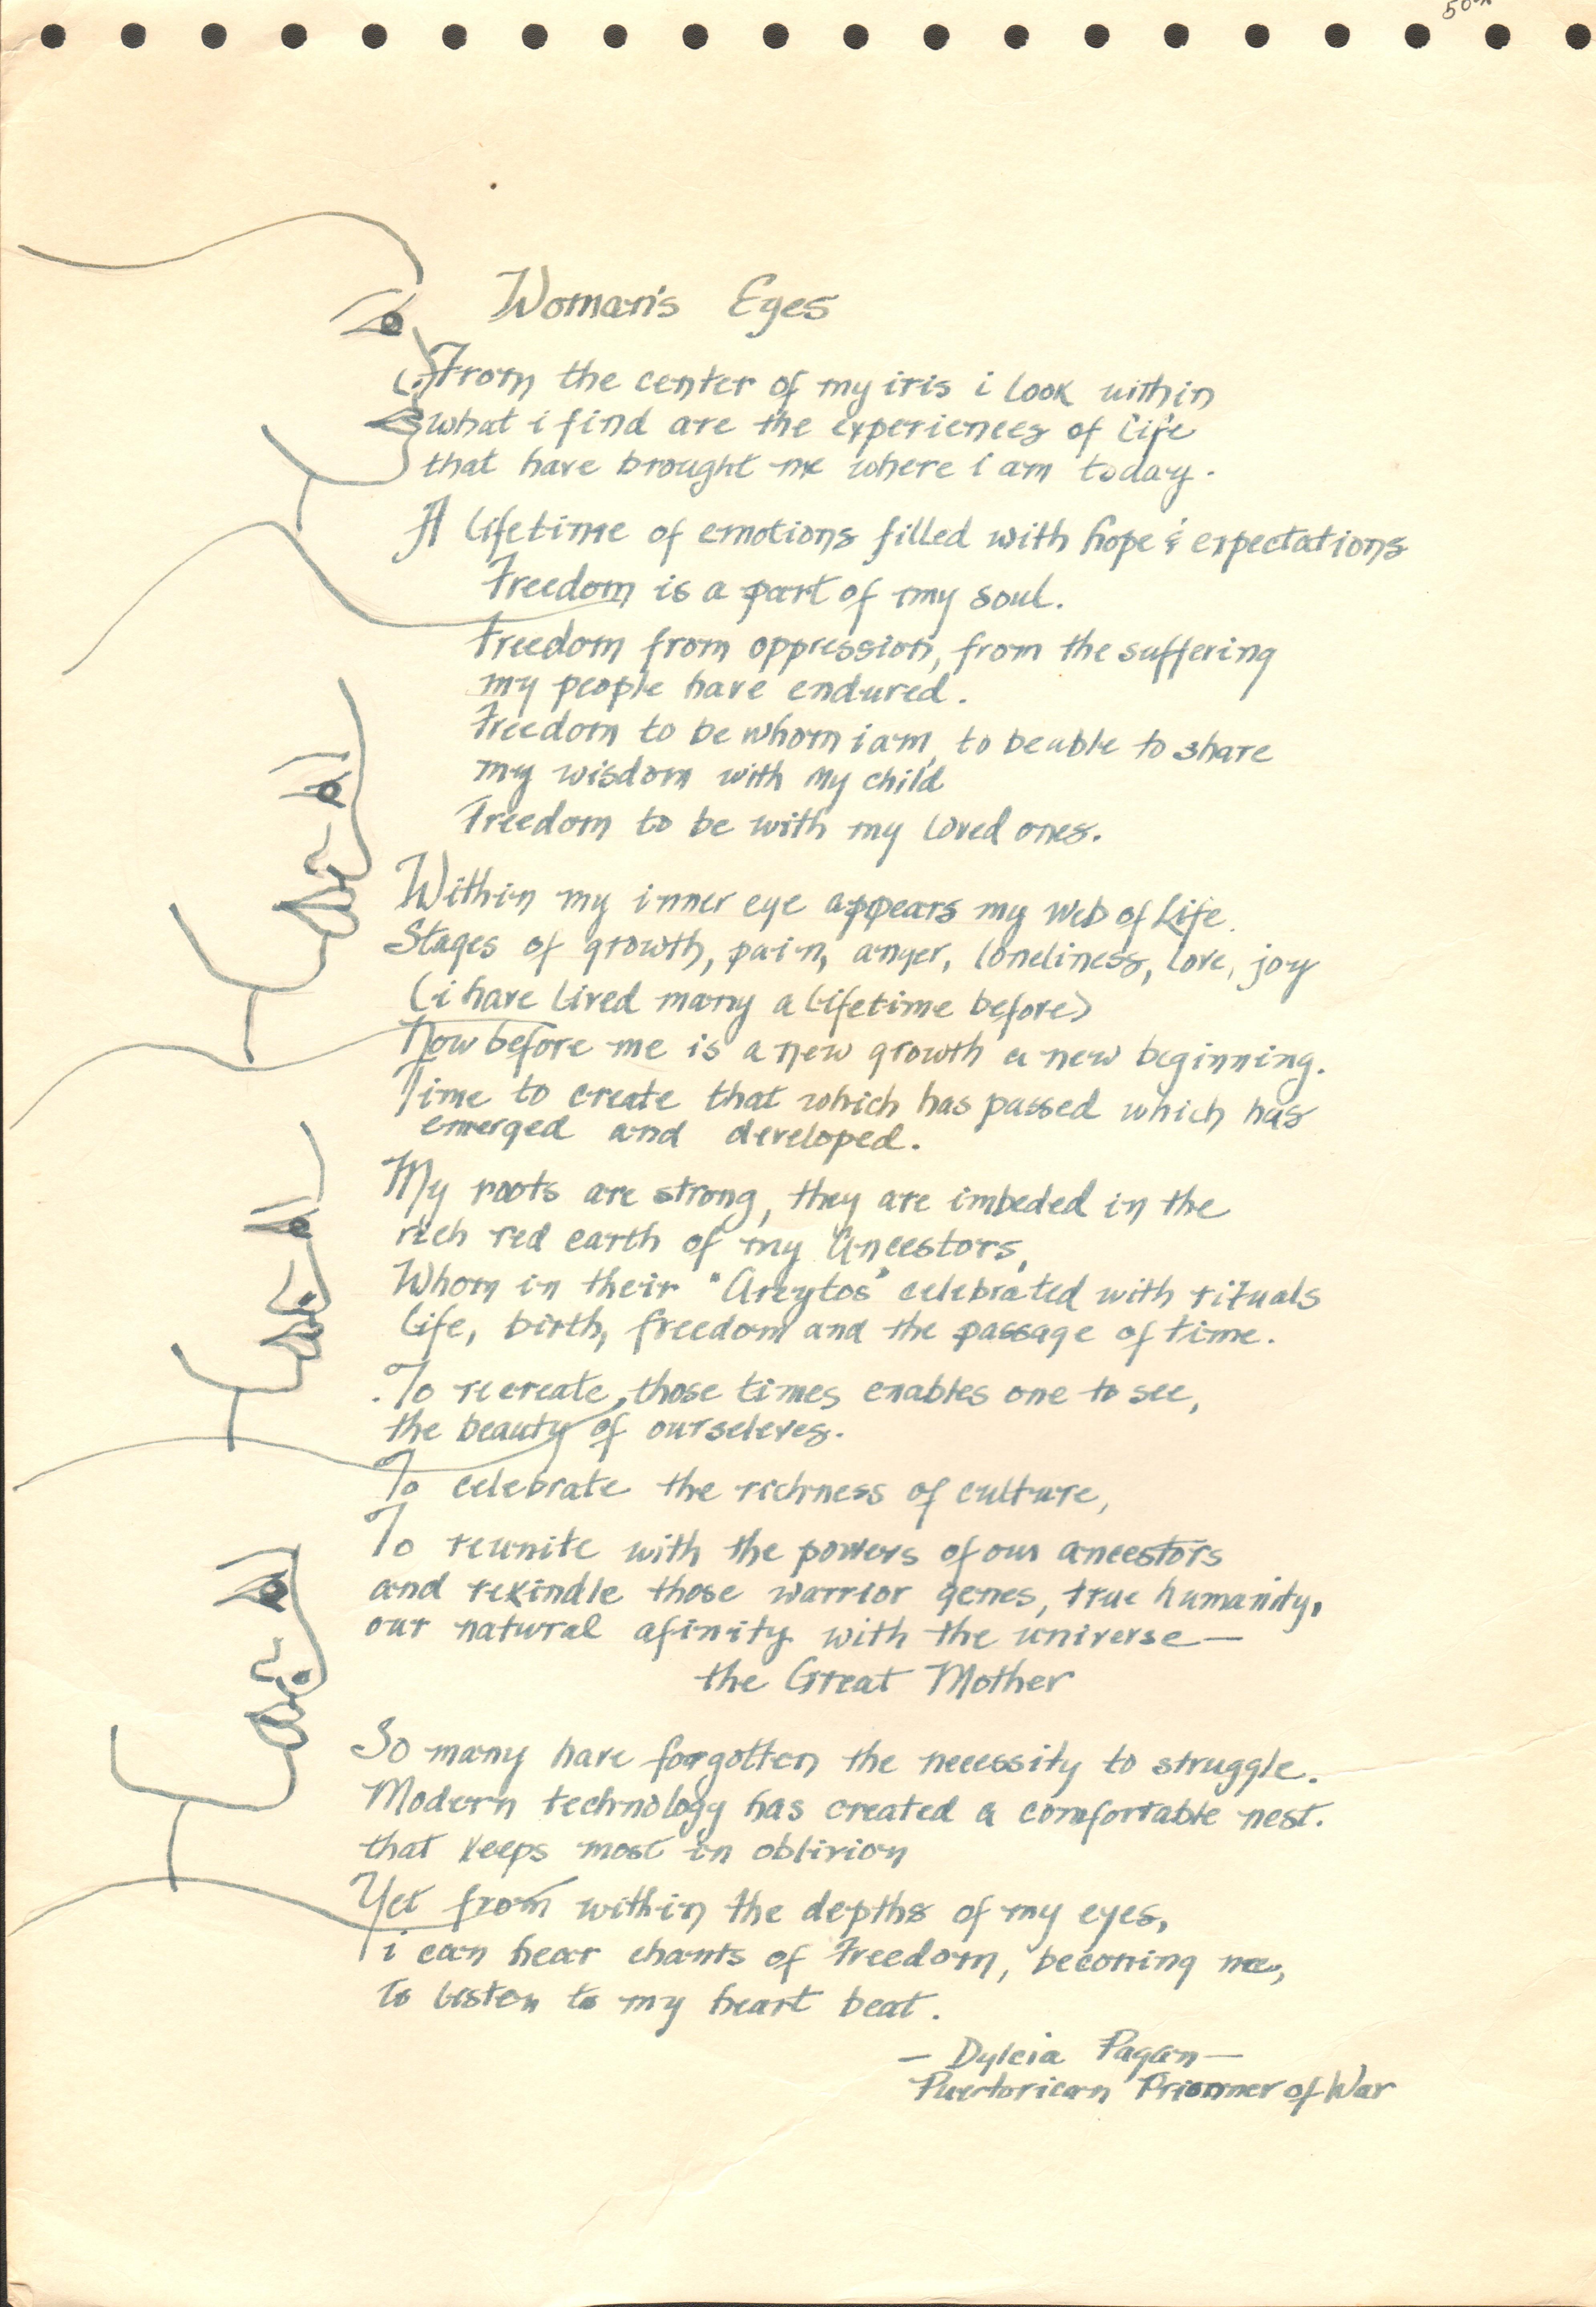 Poem by Dylcia Pagan (former Puerto Rican Prisoner of War)